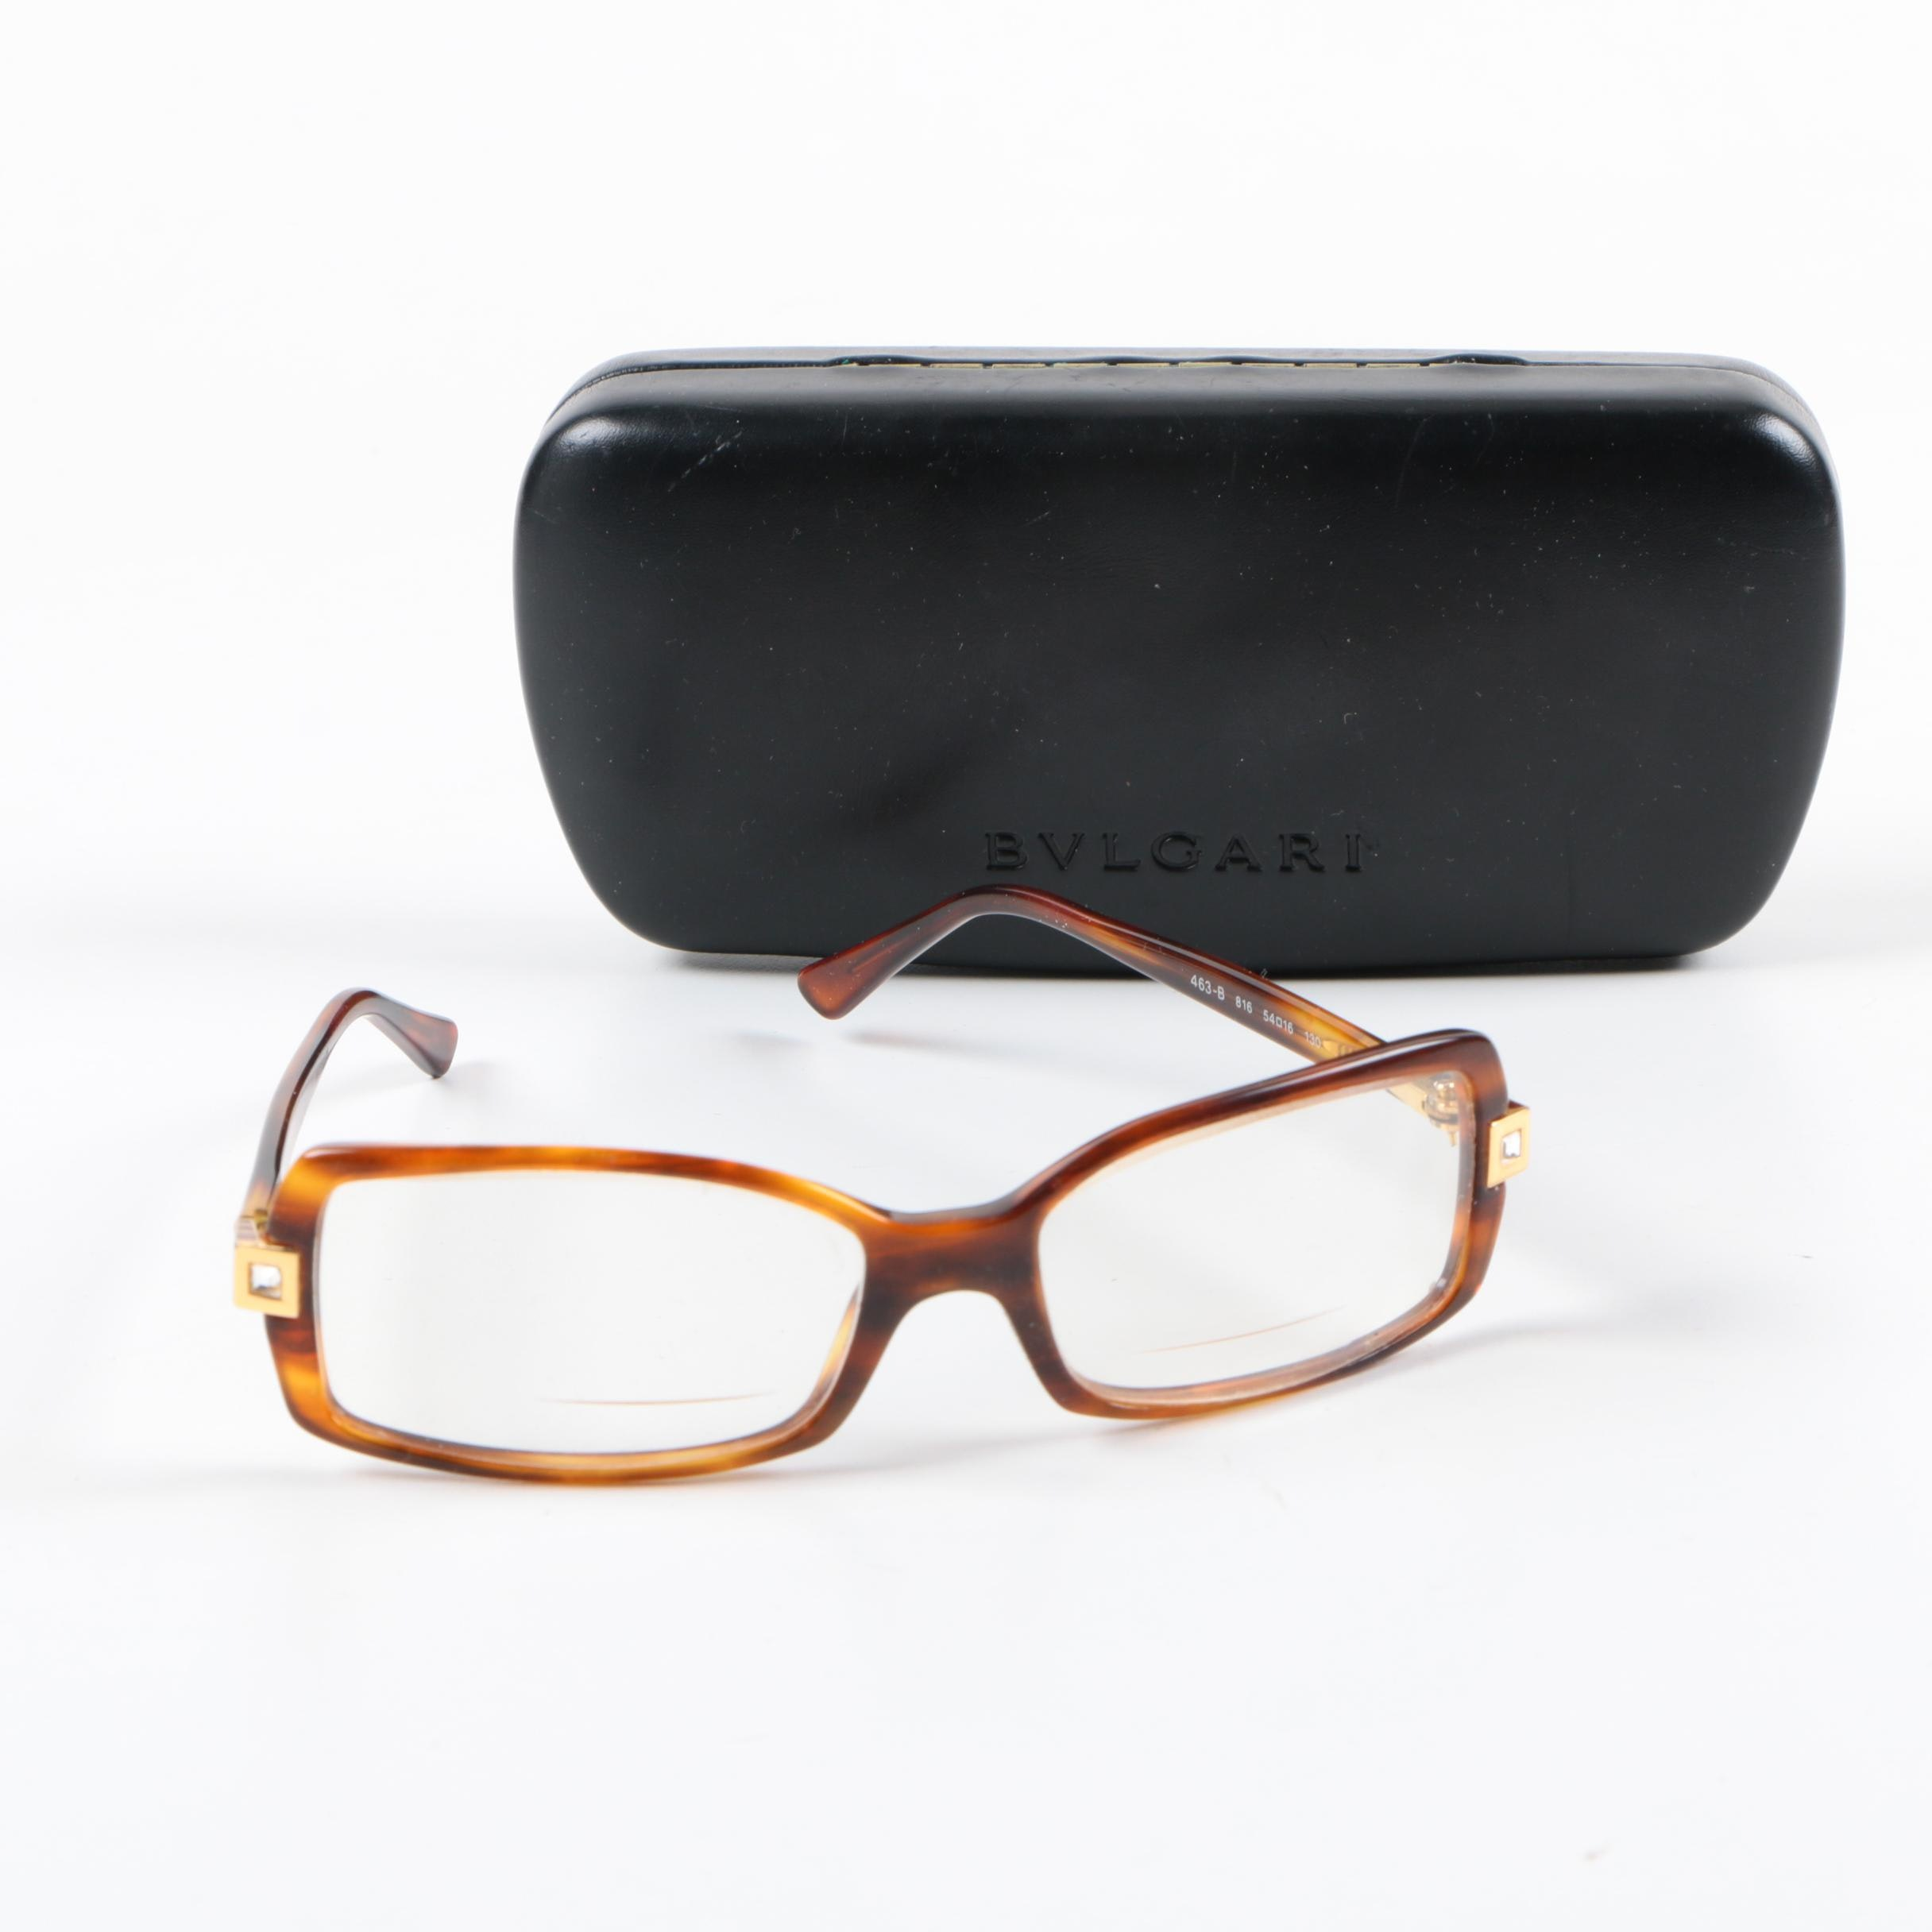 Bvlgari Eyeglasses